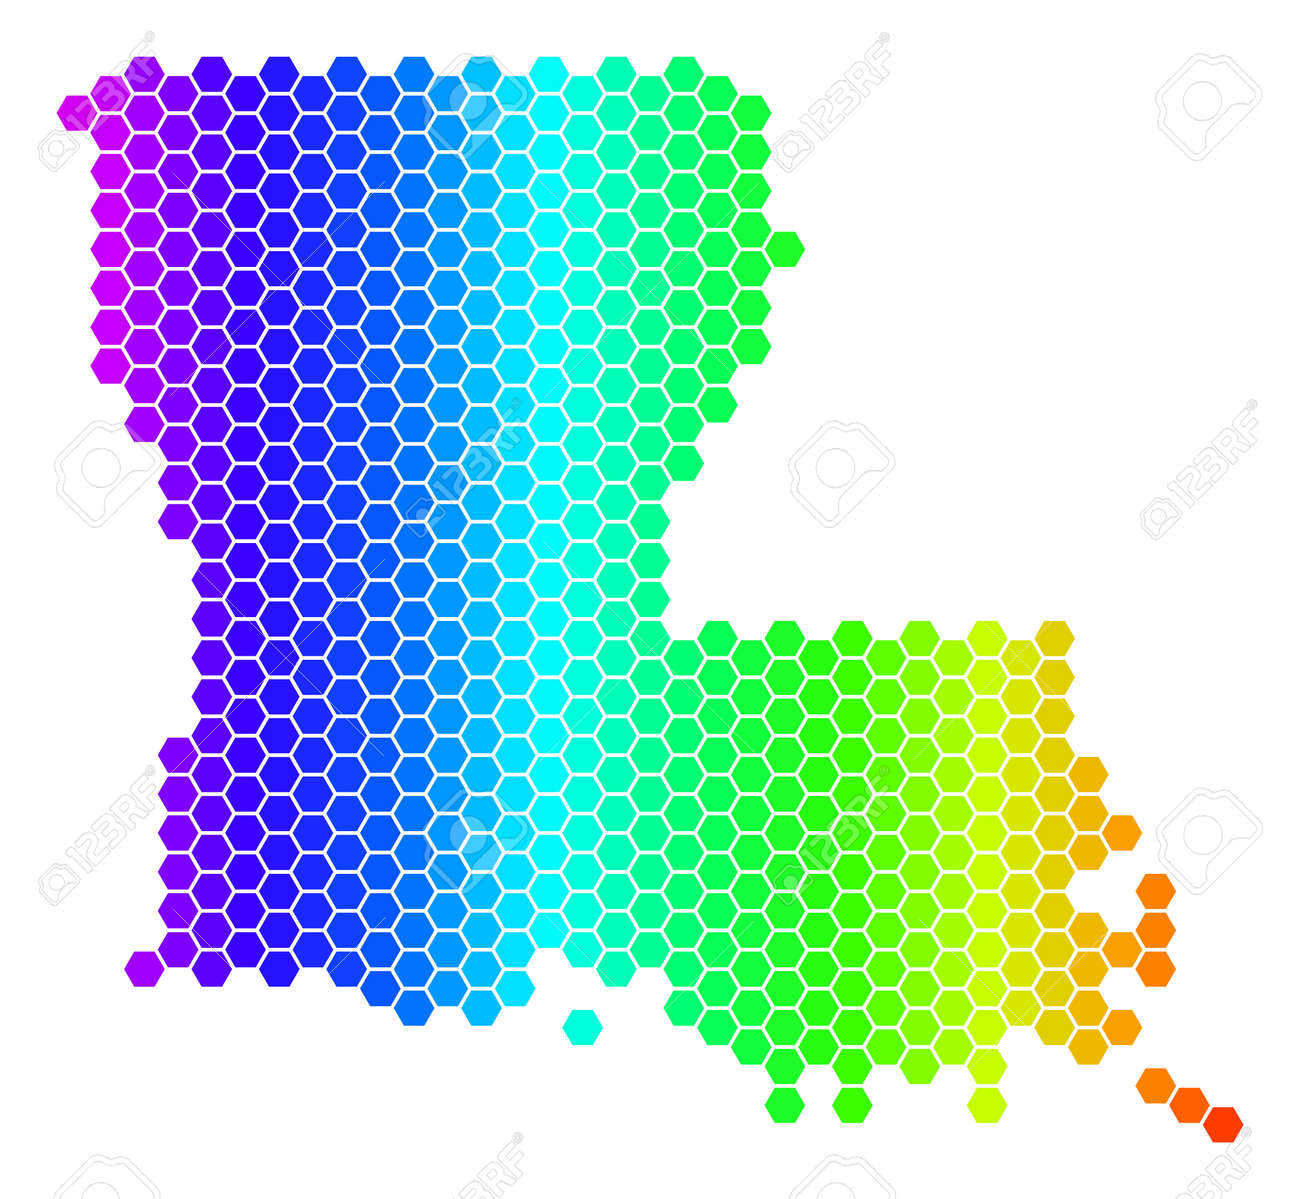 Geographic Map Of Louisiana.Spectrum Hexagonal Louisiana State Map Vector Geographic Map